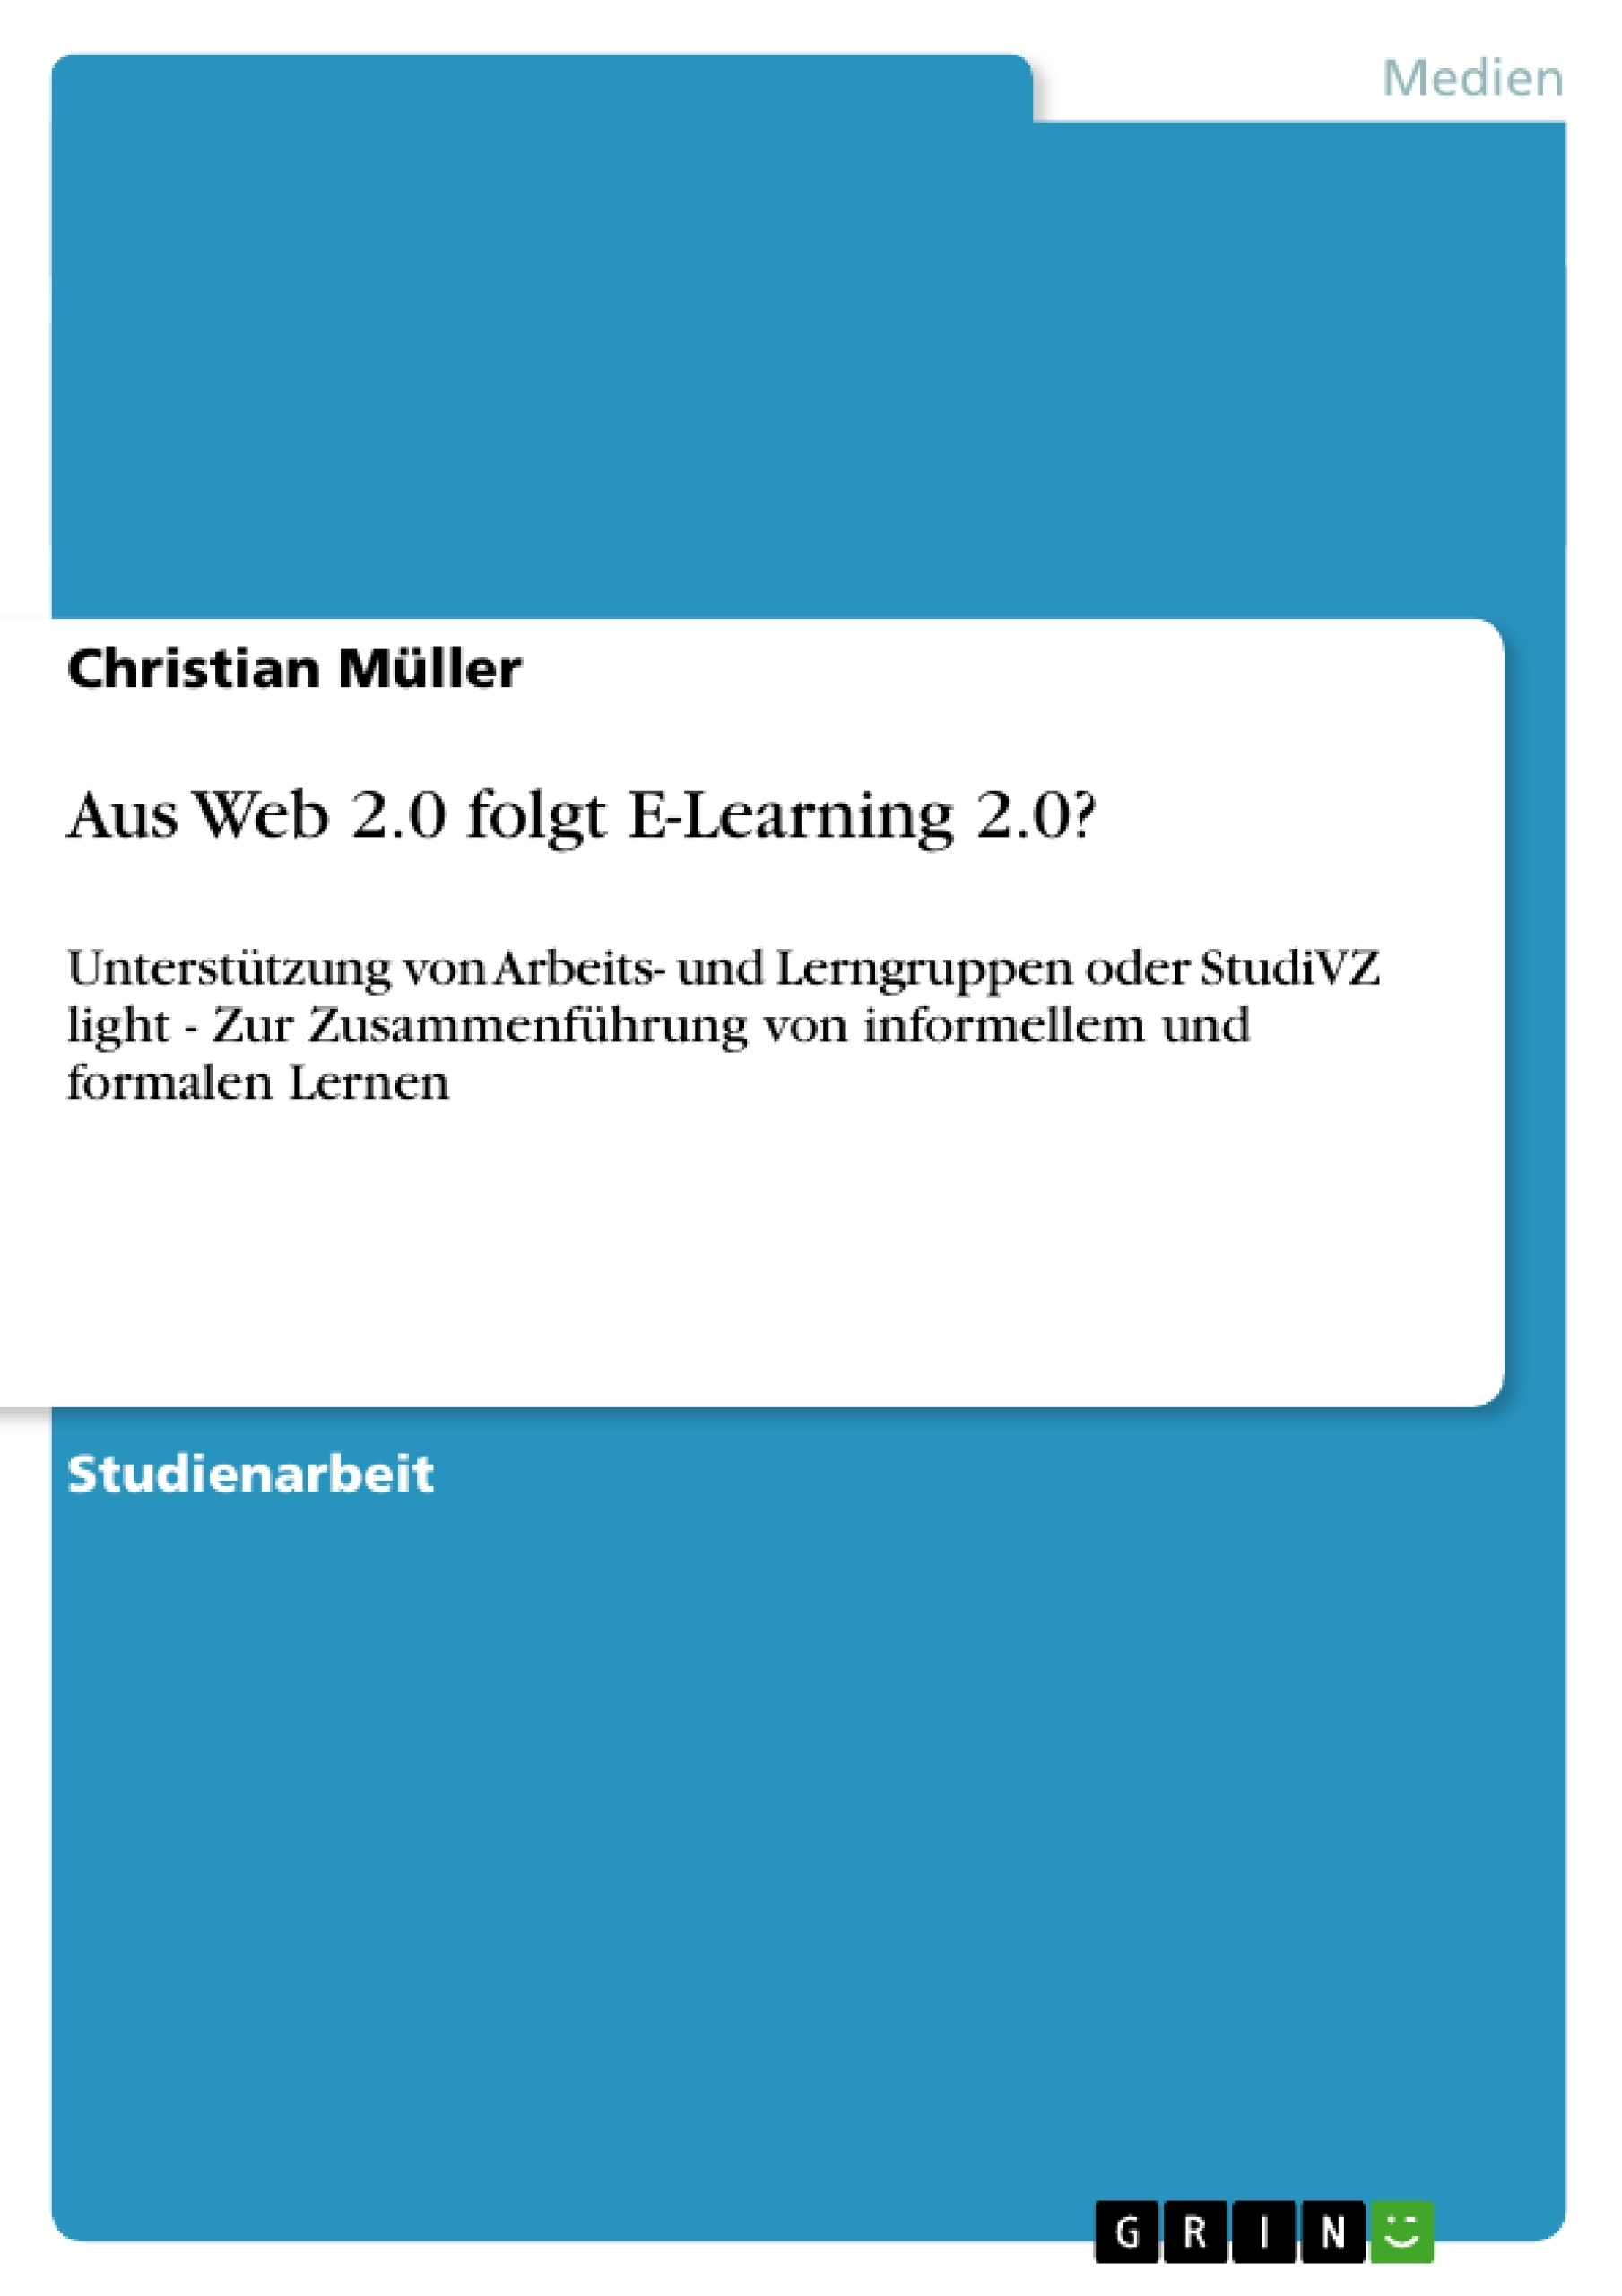 Titel: Aus Web 2.0 folgt E-Learning 2.0?